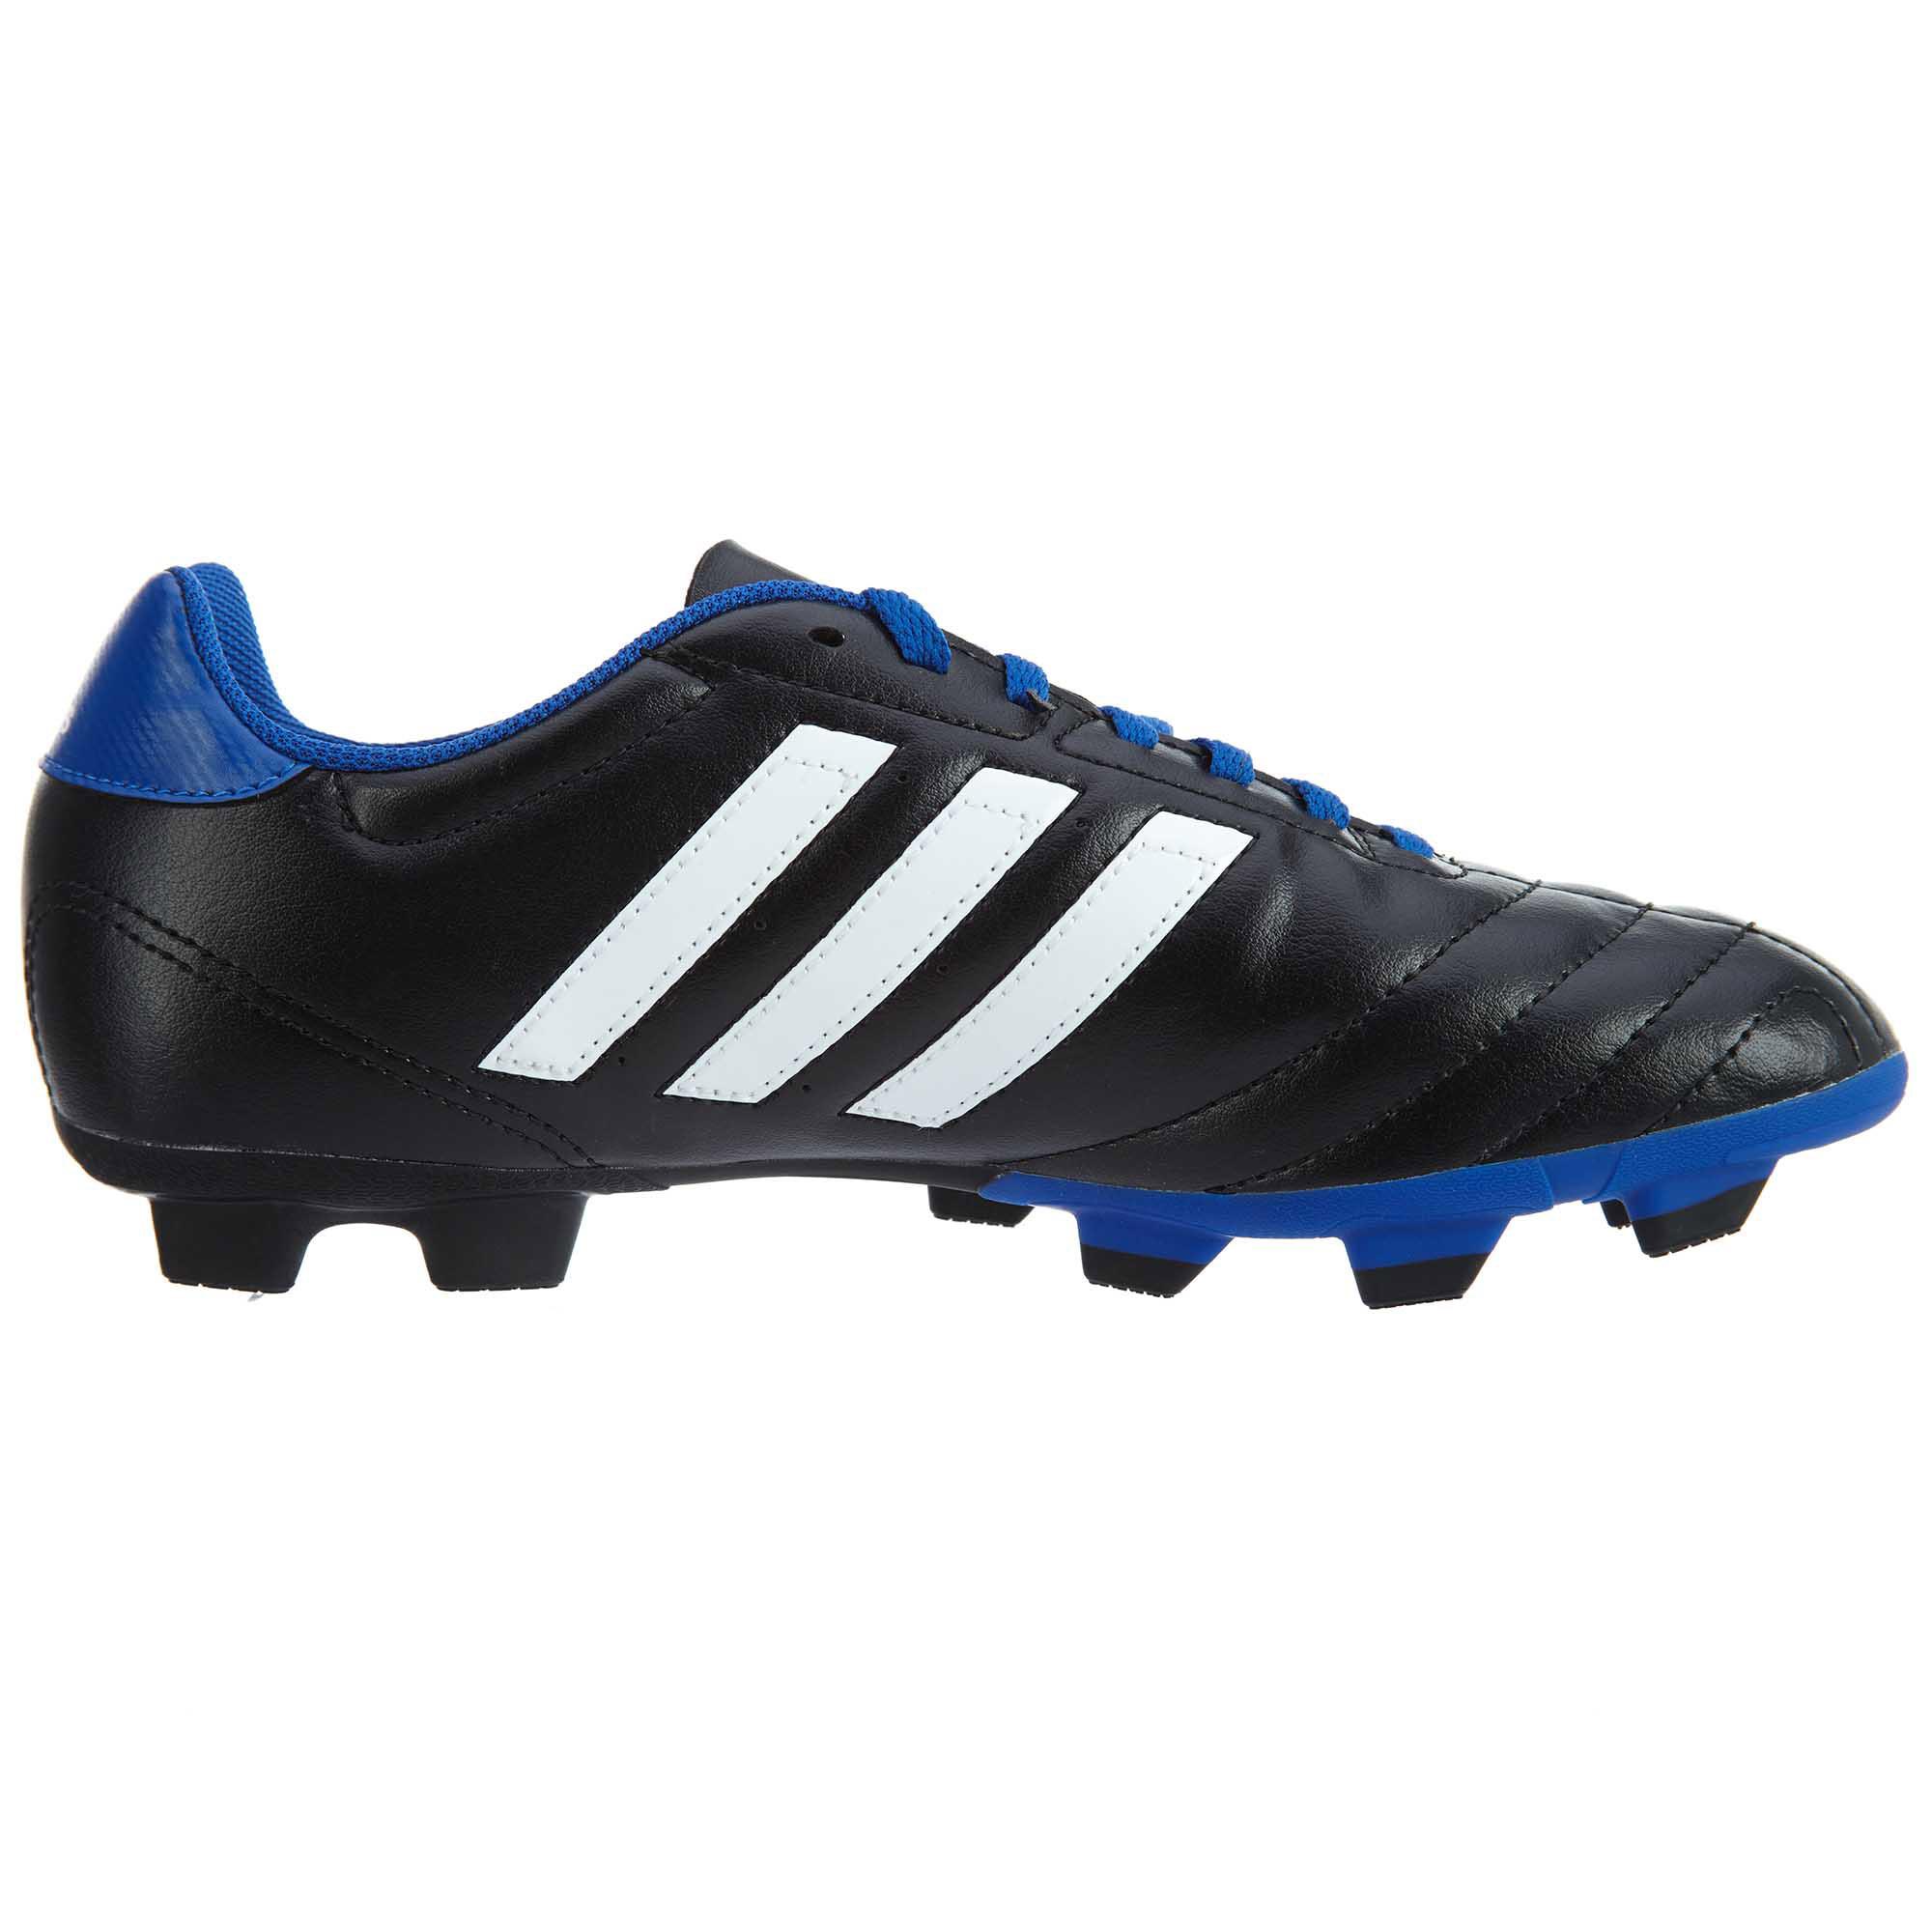 72db62813 ... spain adidas goletto iv trx fg black running white blue c70fe faef8